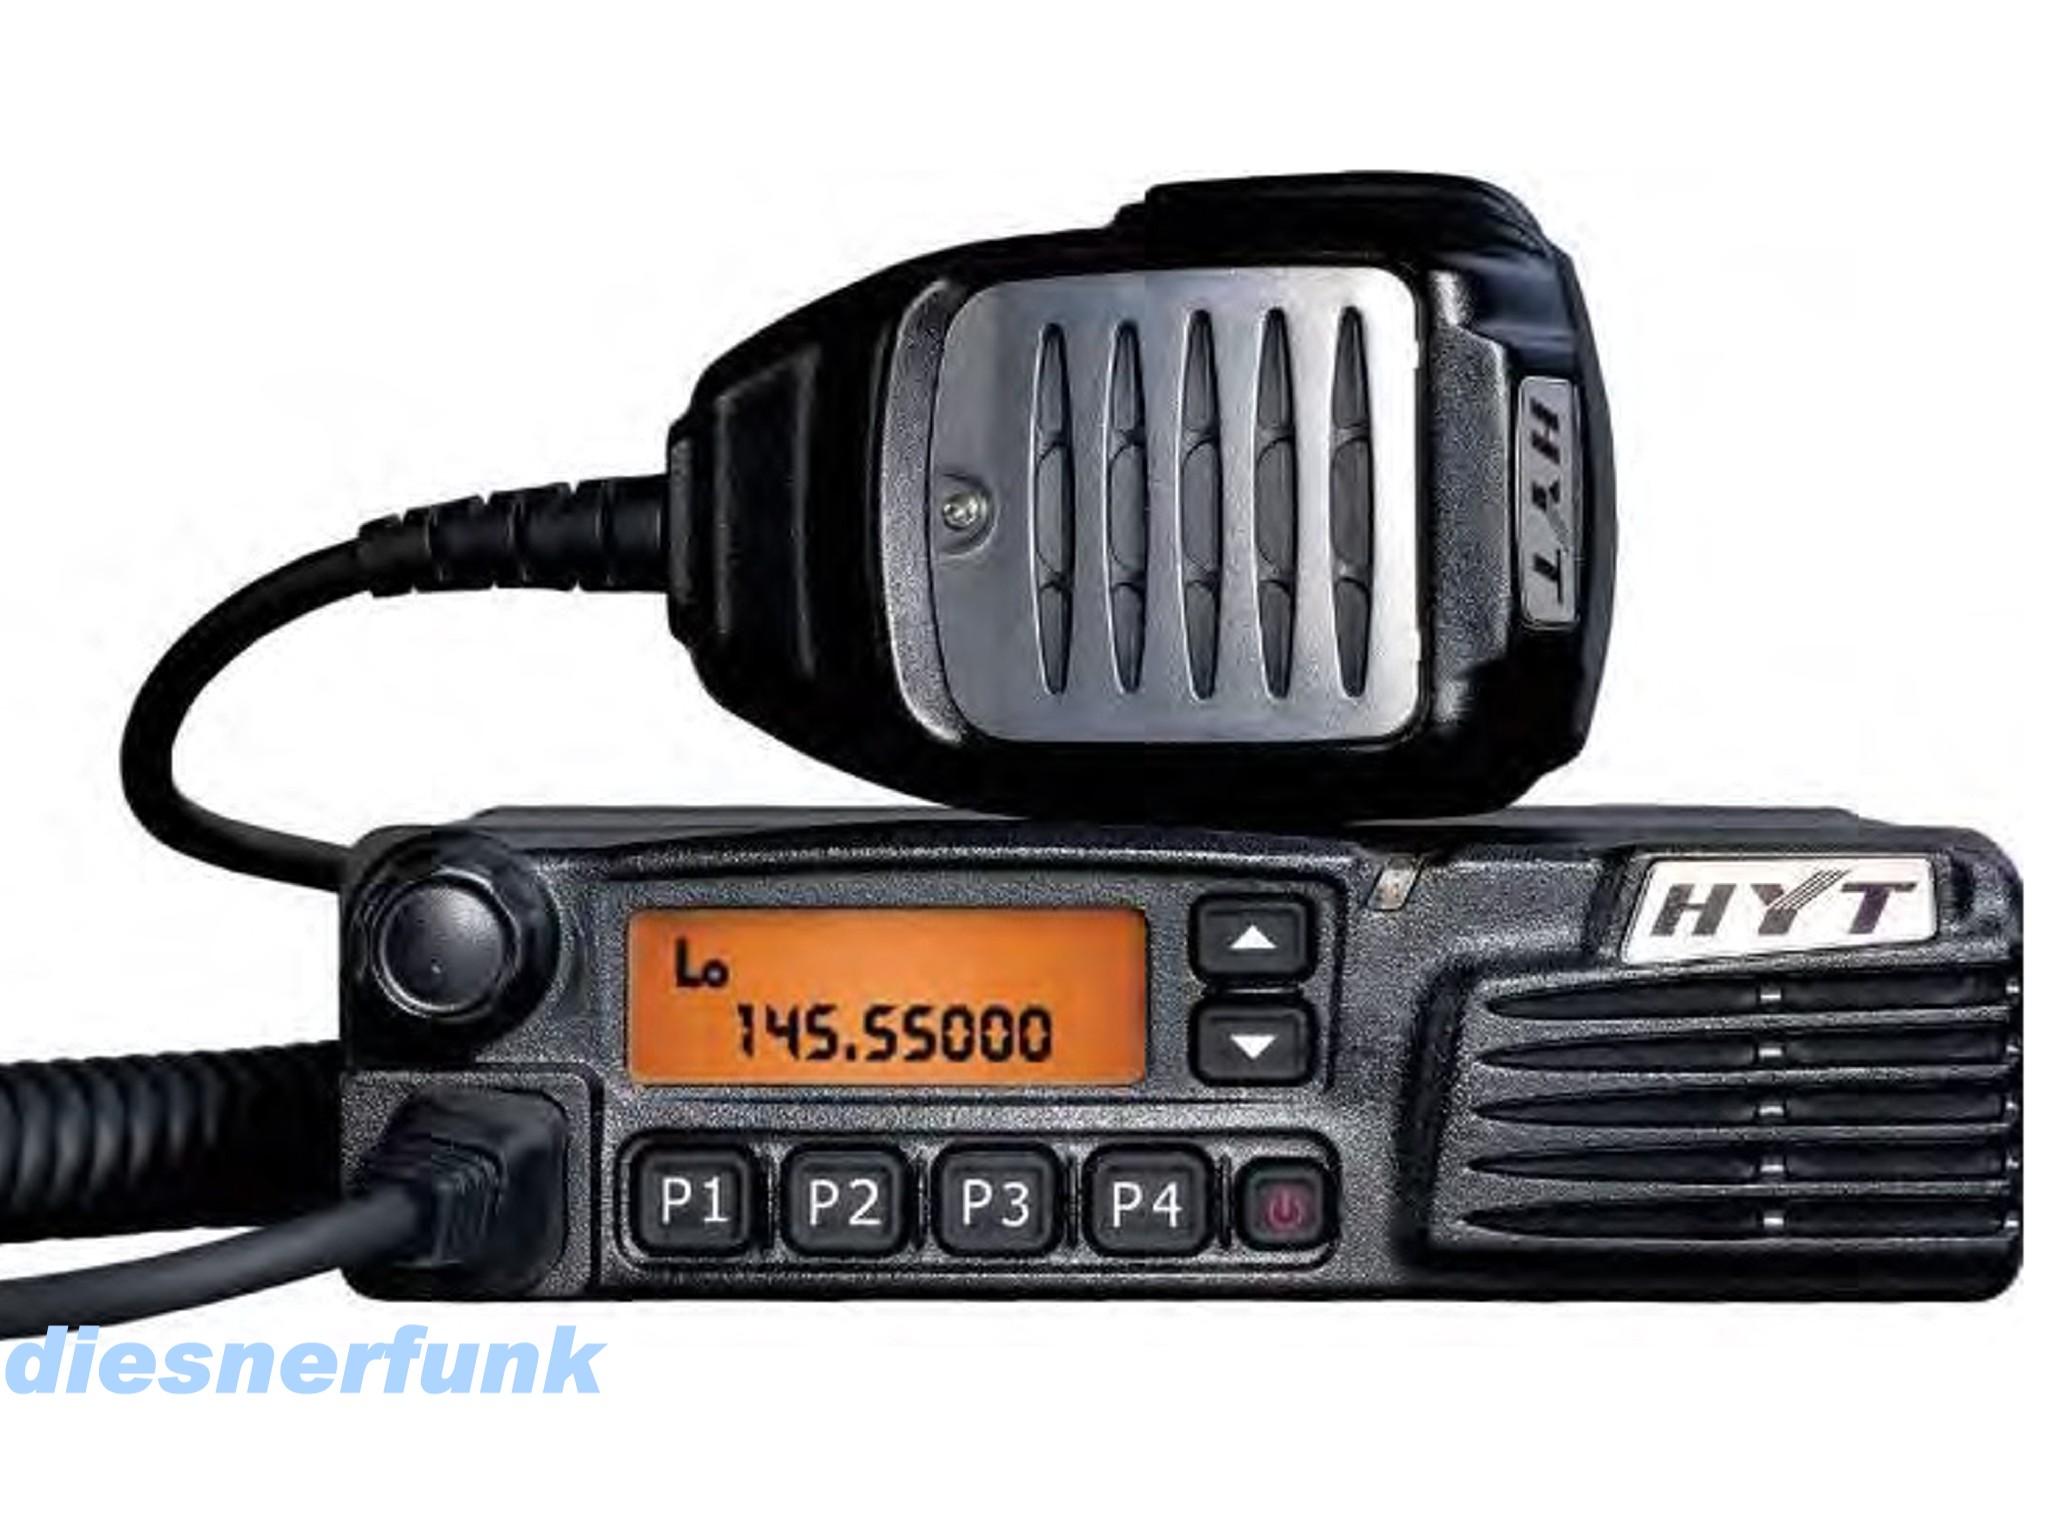 Handys & Kommunikation Cb-funkgeräte Set Albrecht Ae 6110 Mini Cb-funkgerät M Magnetantenne 30 Cm Minimag